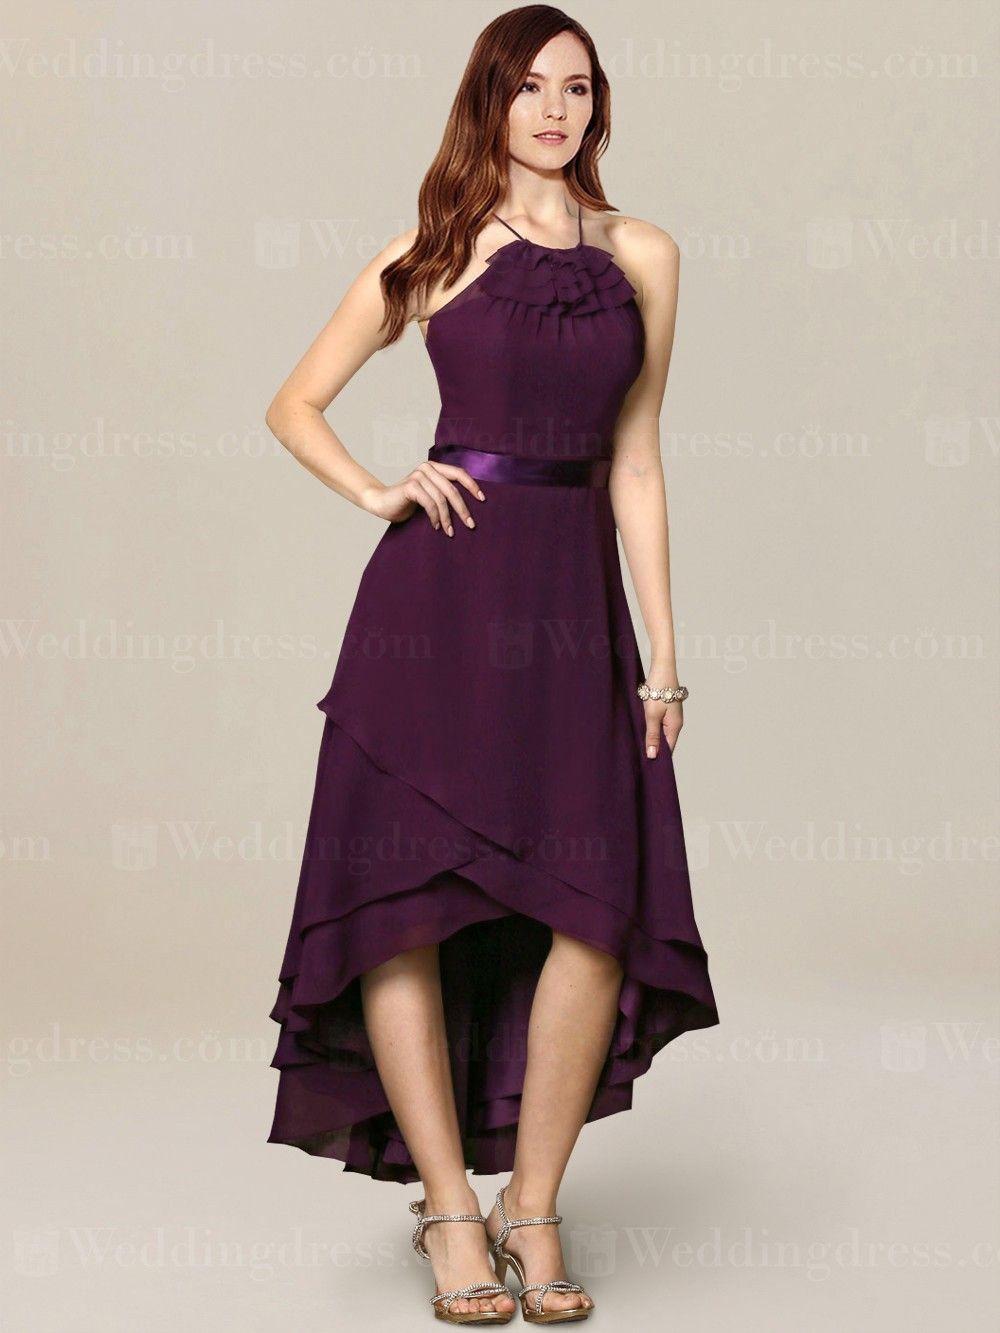 b6b60de17b70 High-low chiffon bridesmaid dress is an A-line dress to flatter any figures